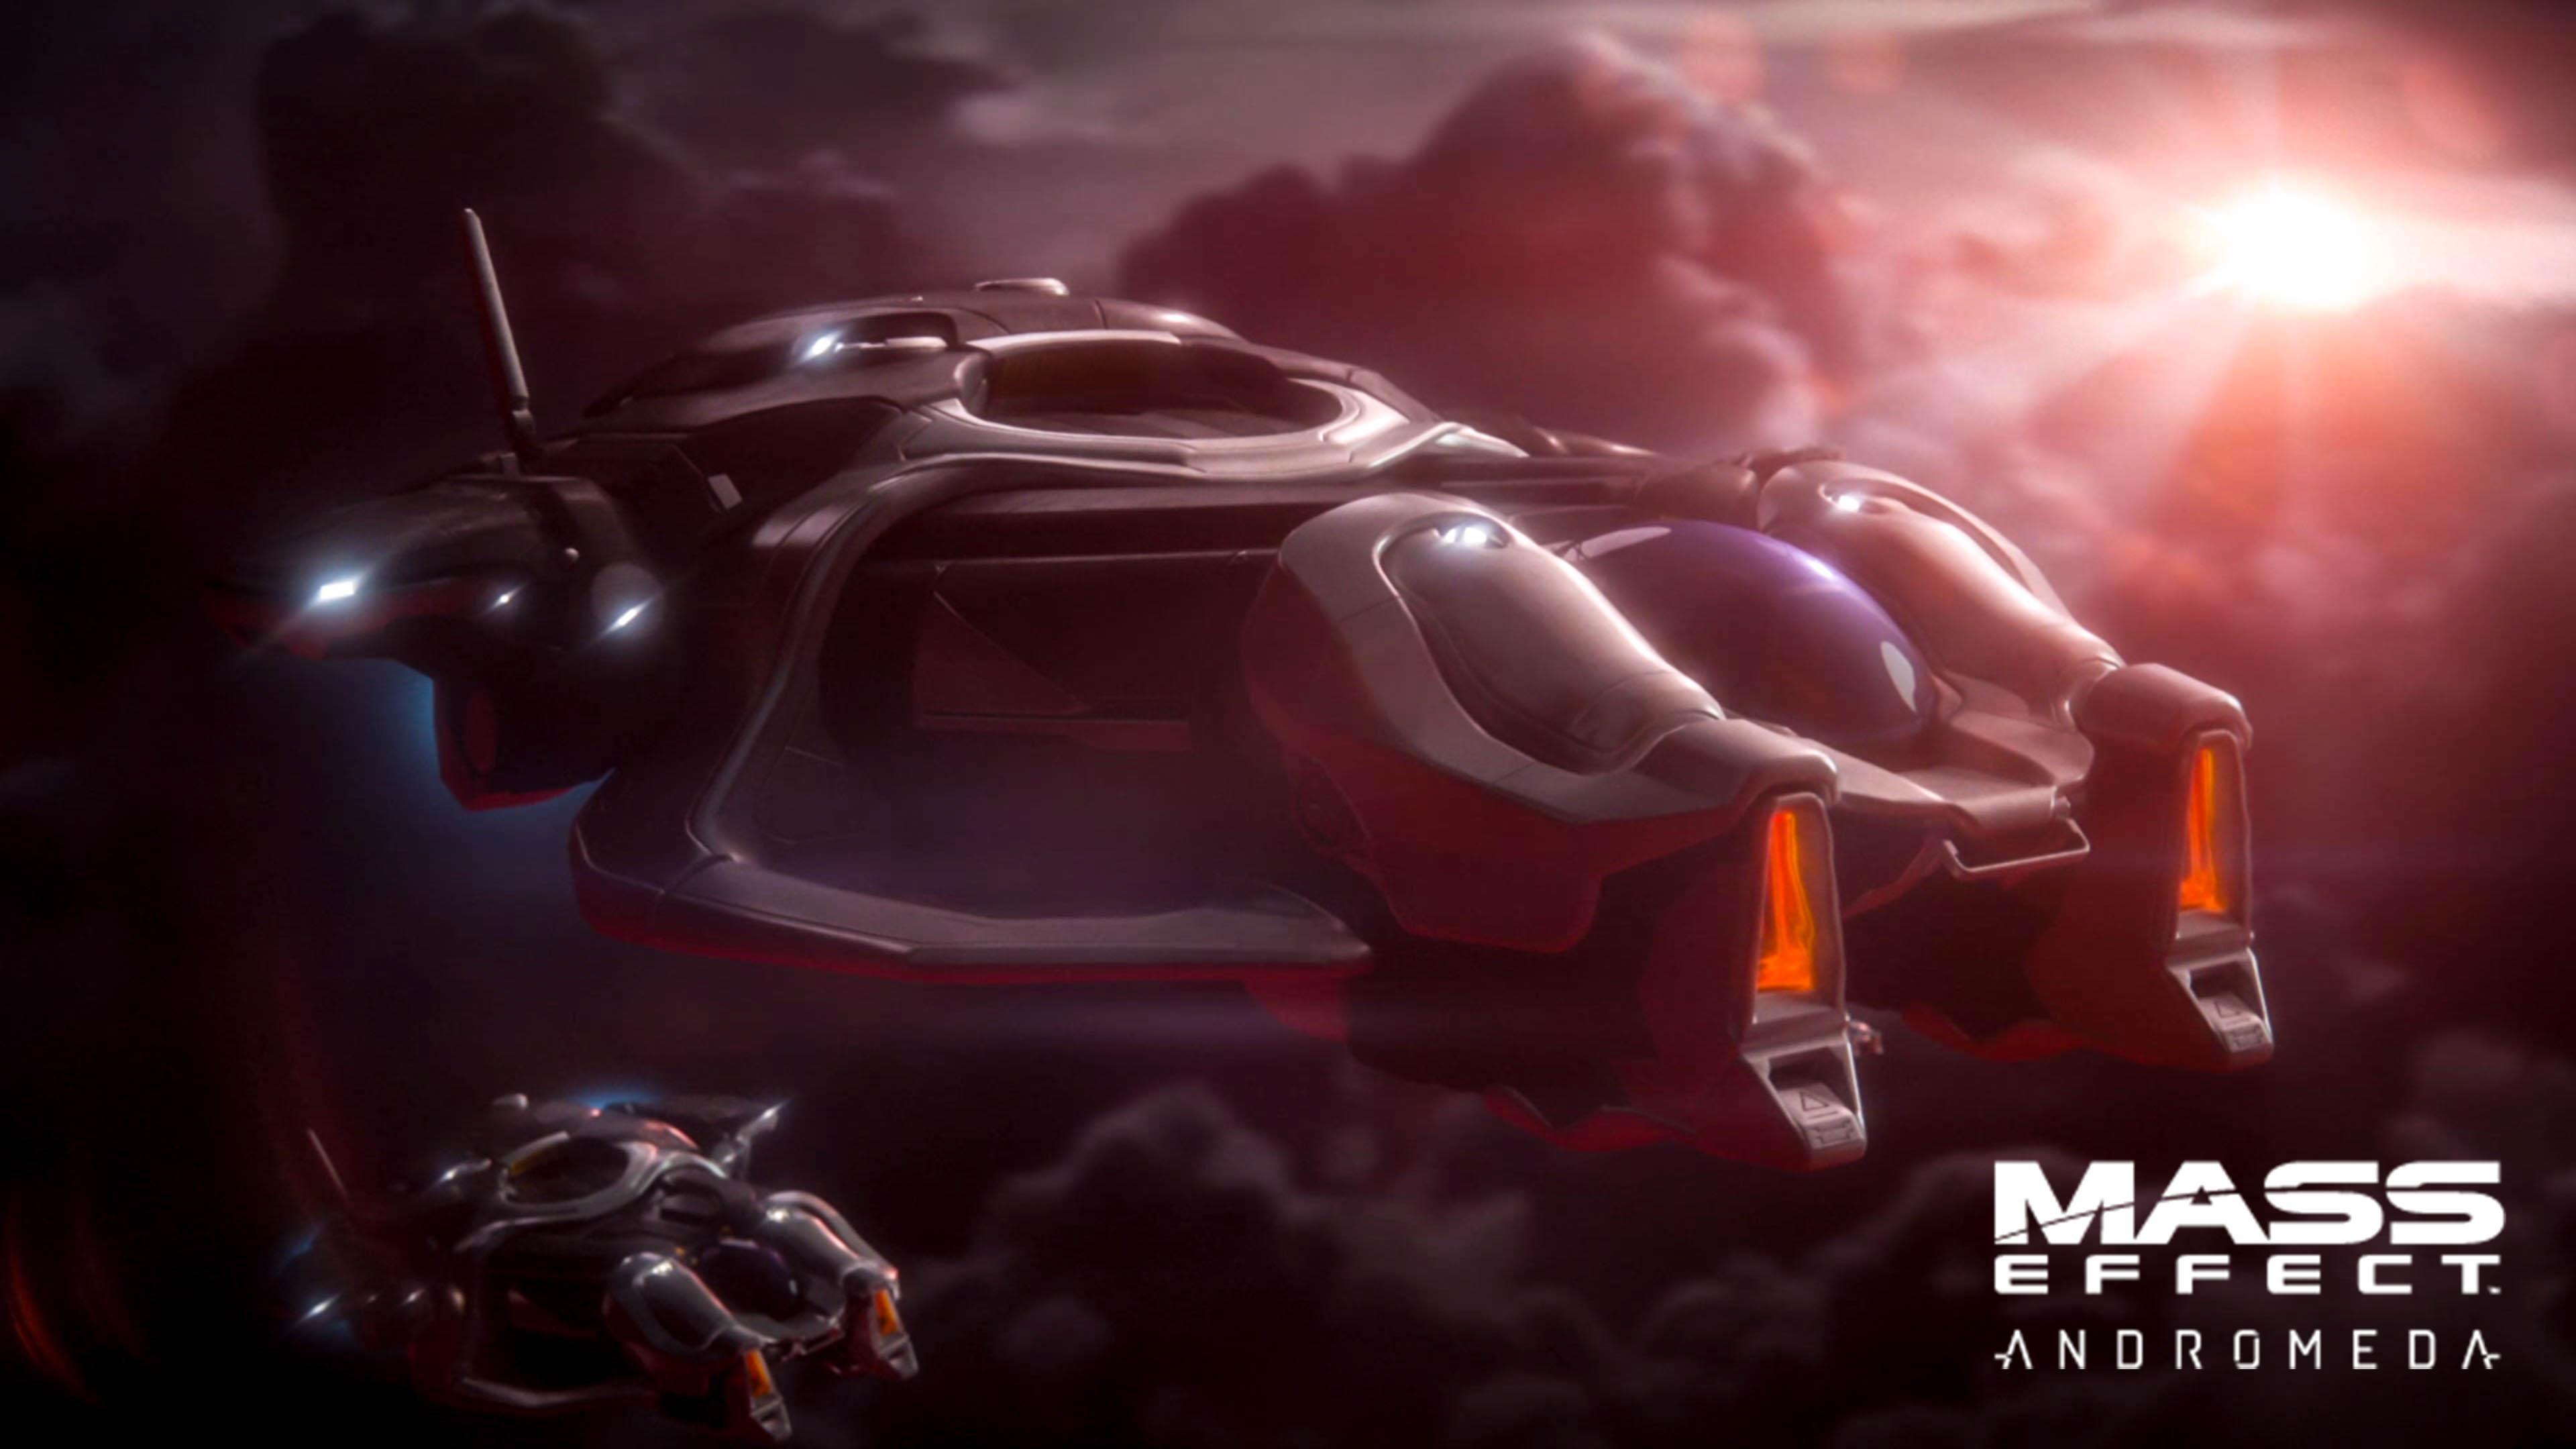 X5 Ghost Mass Effect Andromeda: Mass Effect Andromeda: In Una Cut Scene Spunta Un Fucile